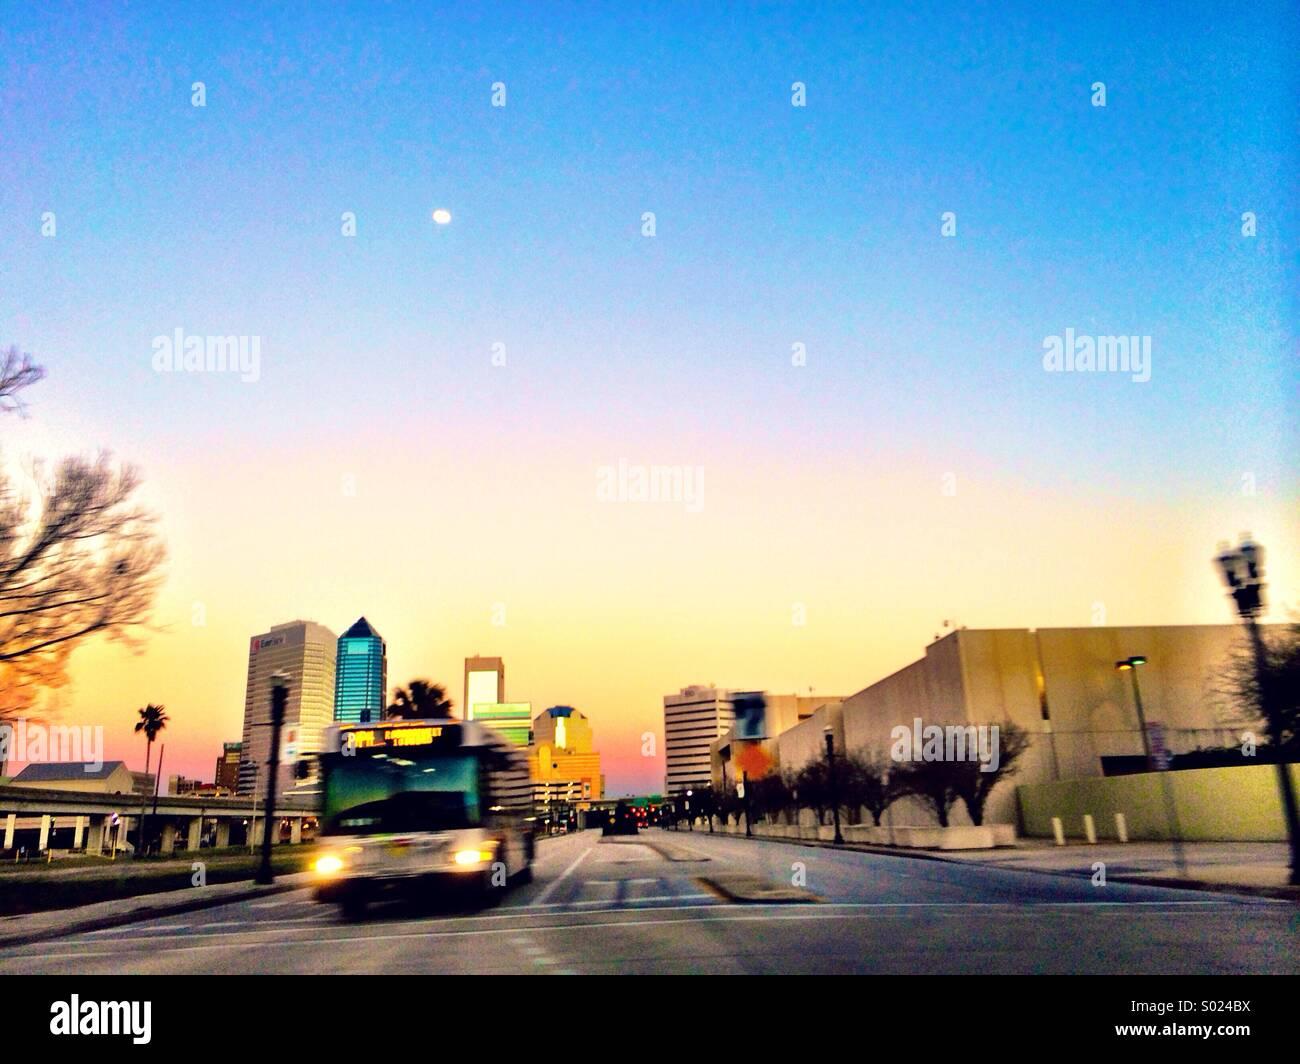 City Bus - Stock Image